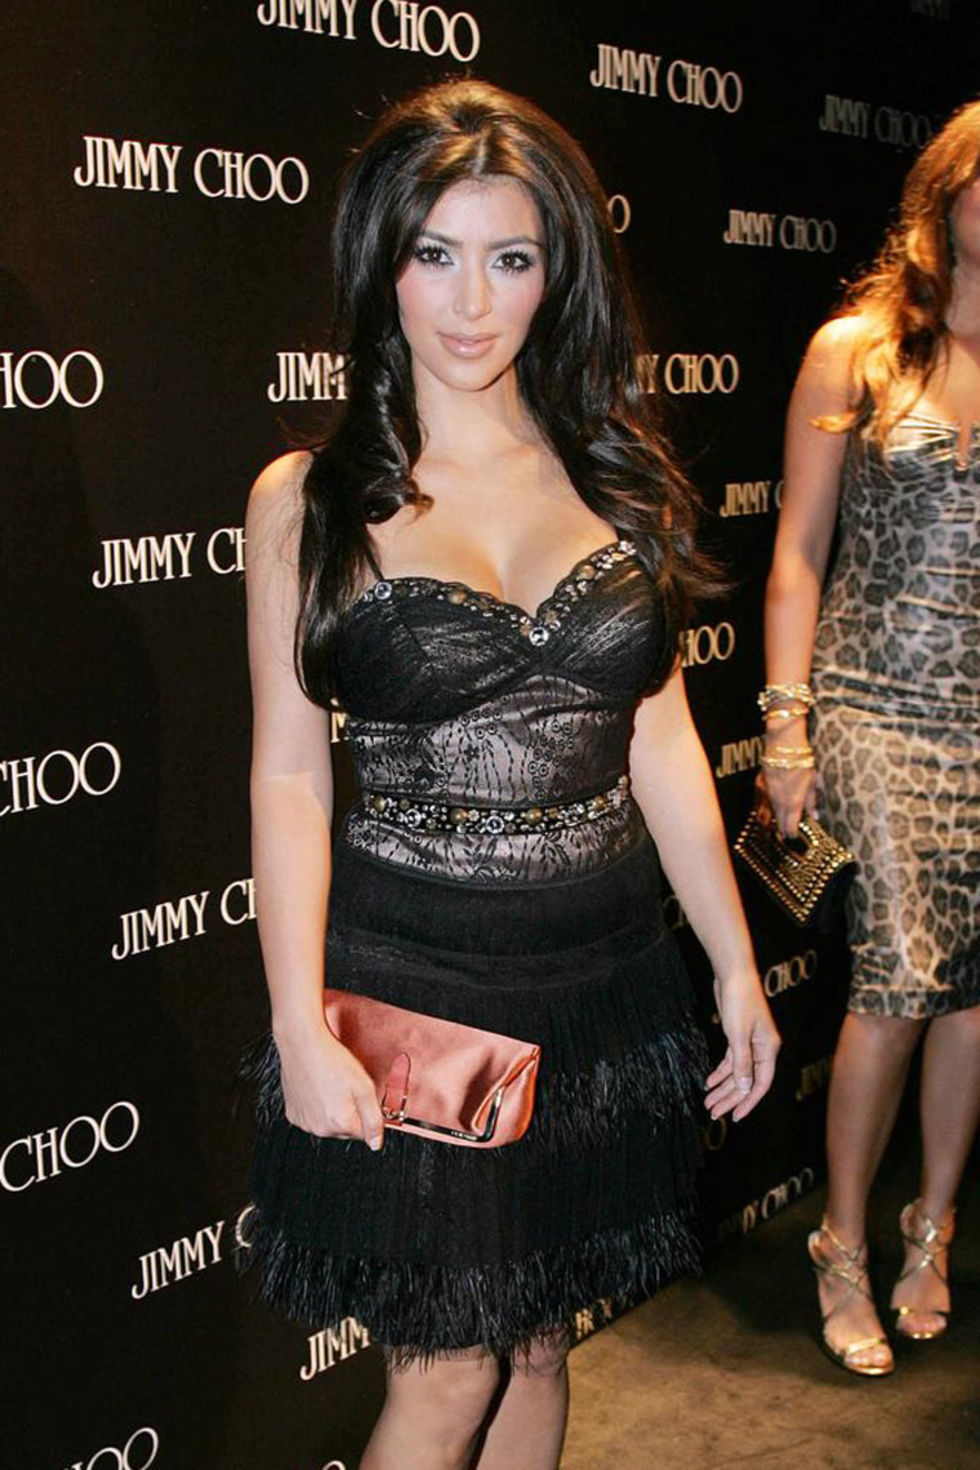 kim-kardashian-launch-of-jimmy-choo-boutique-in-sydney-01